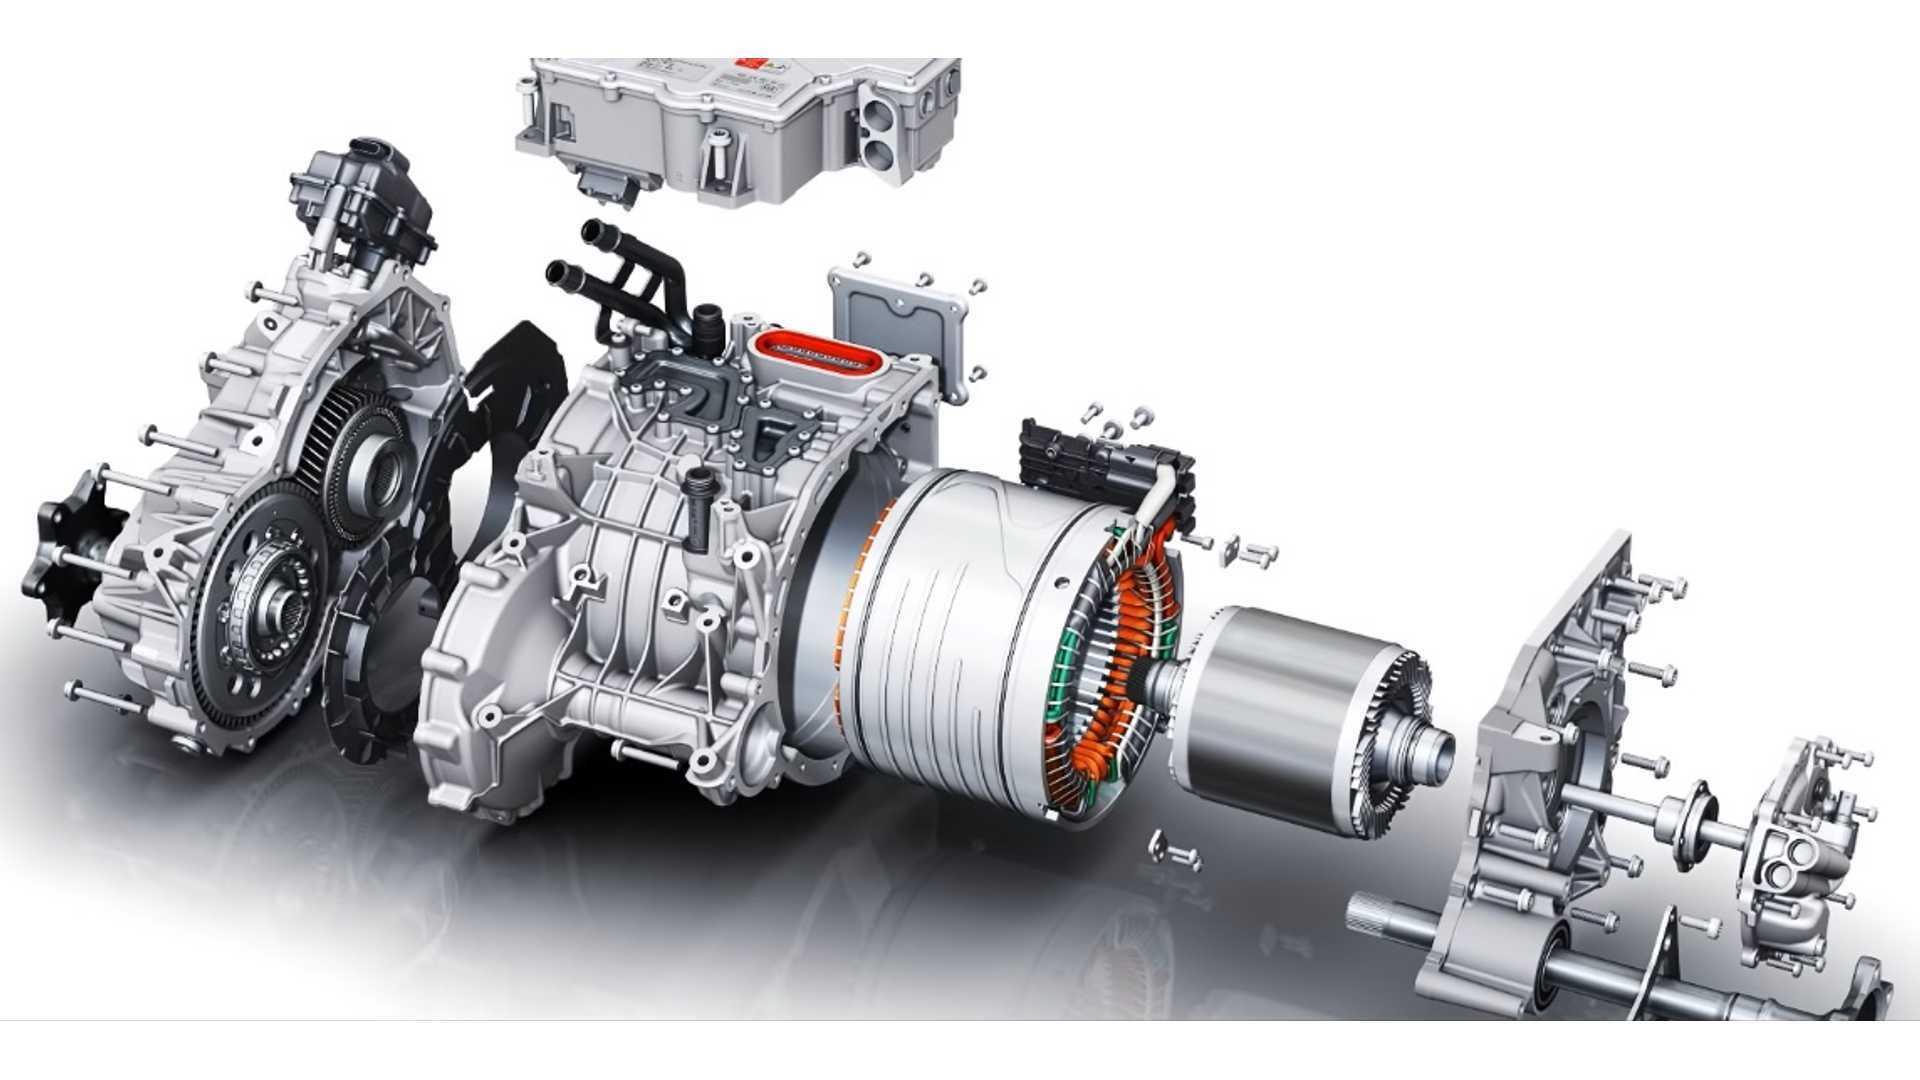 Audi e-tron Electric Motor Explored: Video